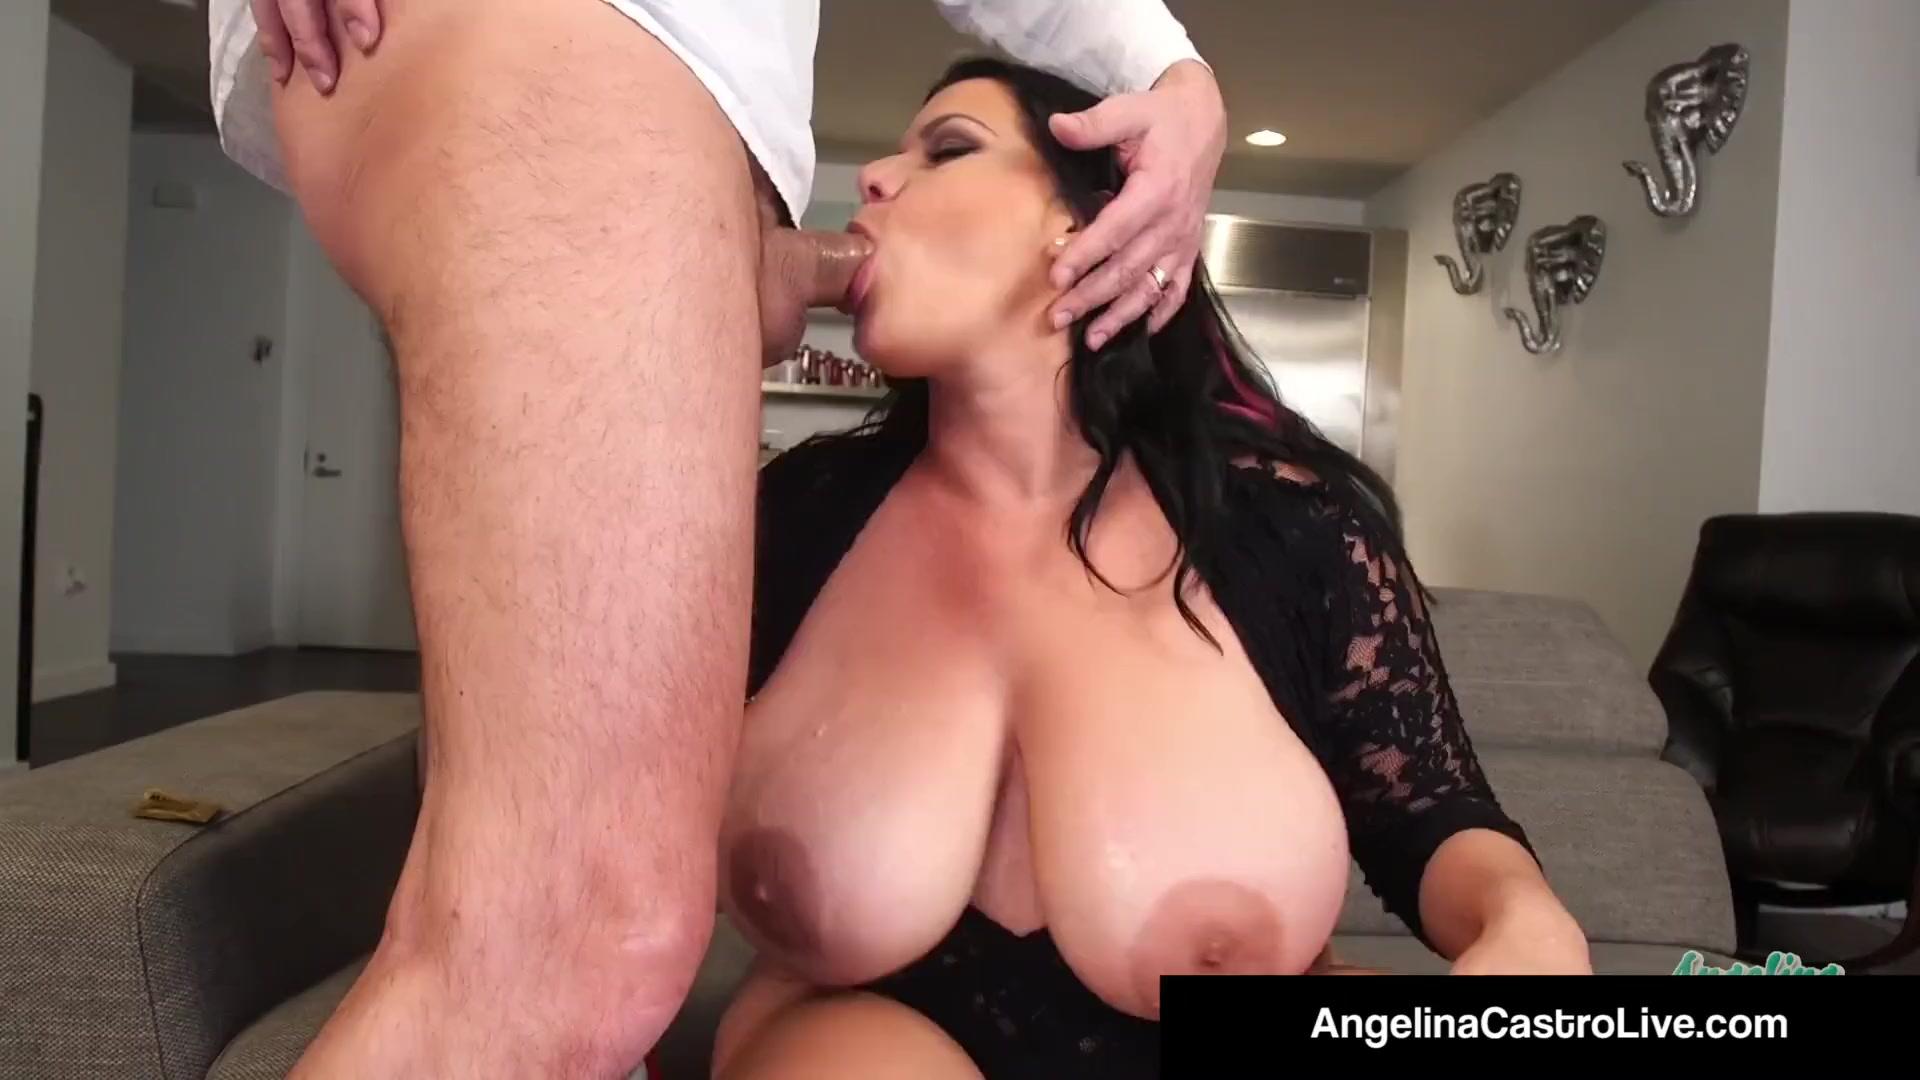 Roberta gemma valeria visconti porn video tube